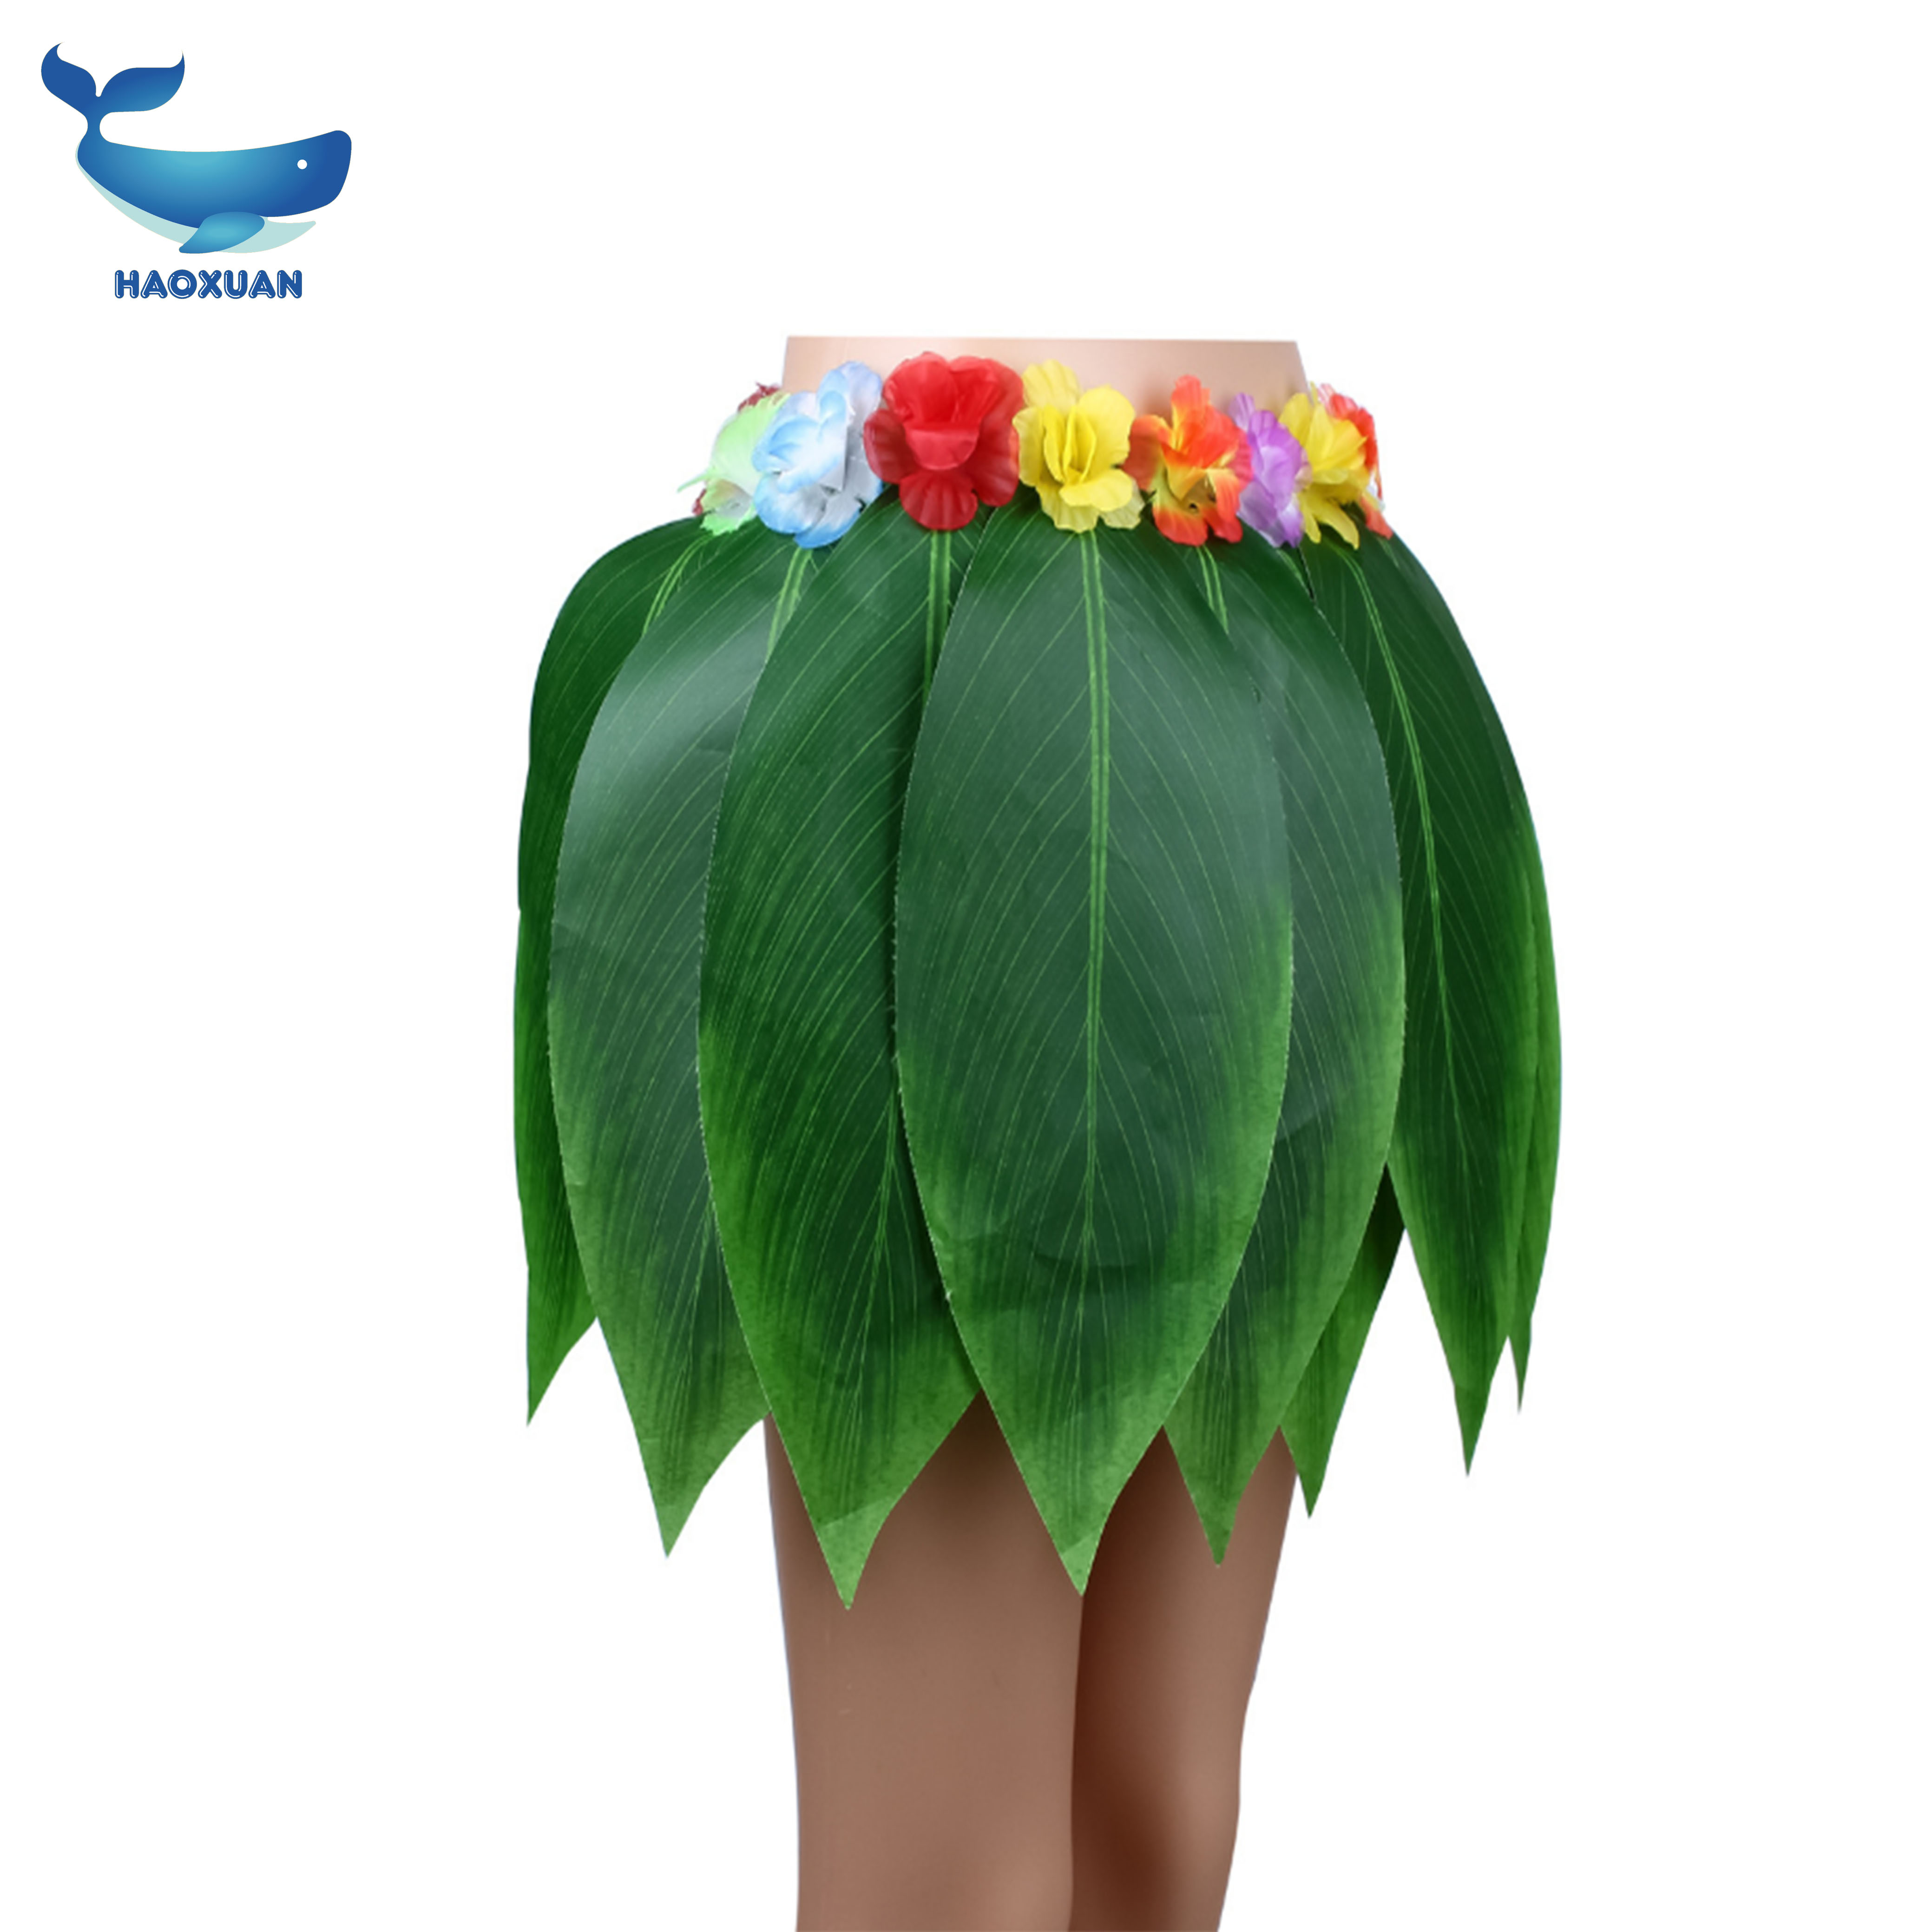 Wholesale hawaii decoration online buy best hawaii decoration from 2019 wholesale hawaiian party leaf skirt grass skirt adult stronghawaii strong izmirmasajfo